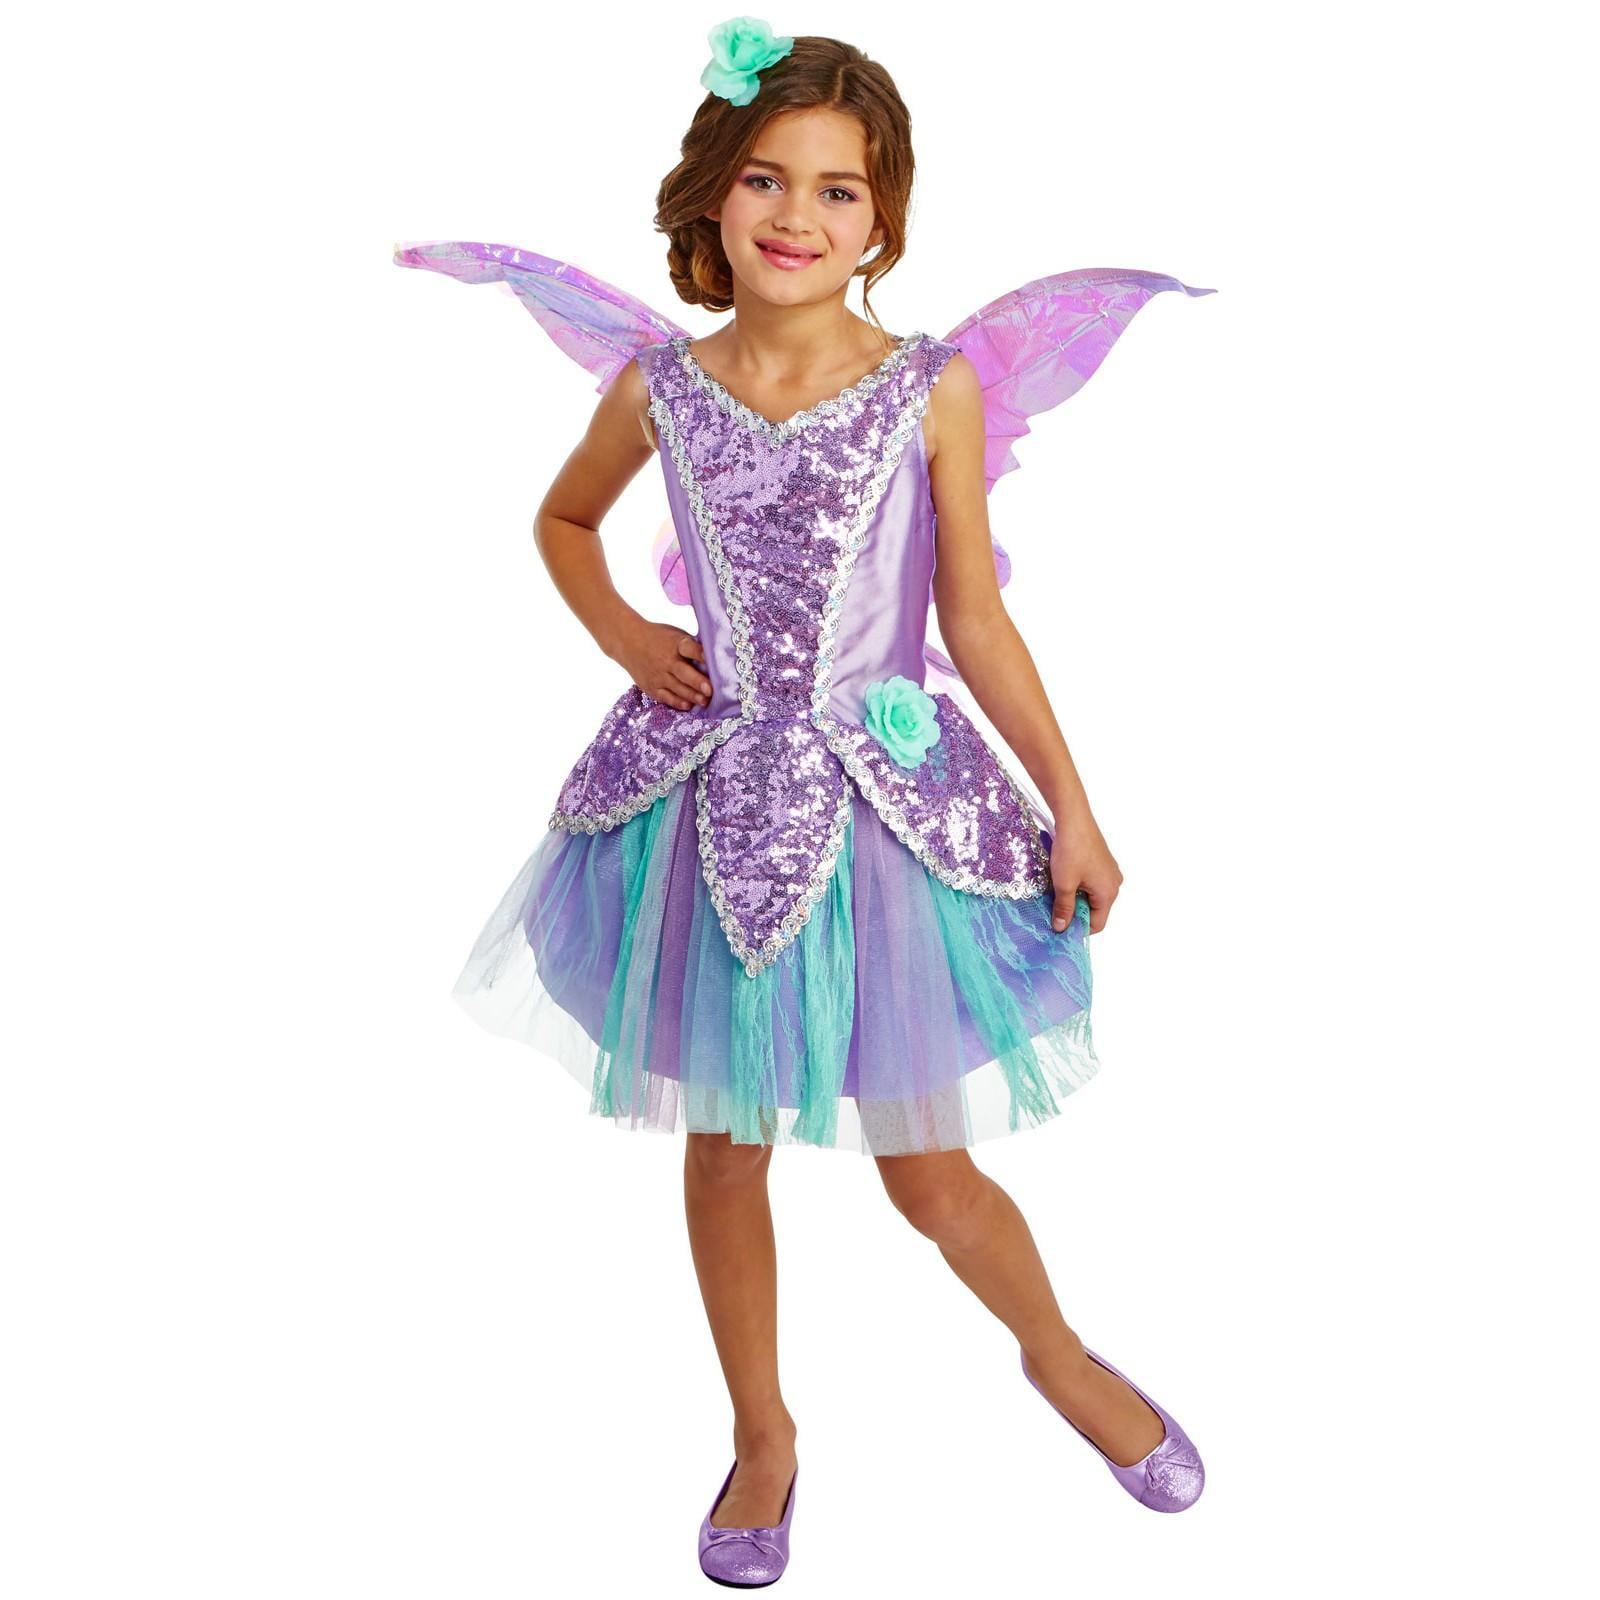 Lavender Fairy Child Costume by Palamon